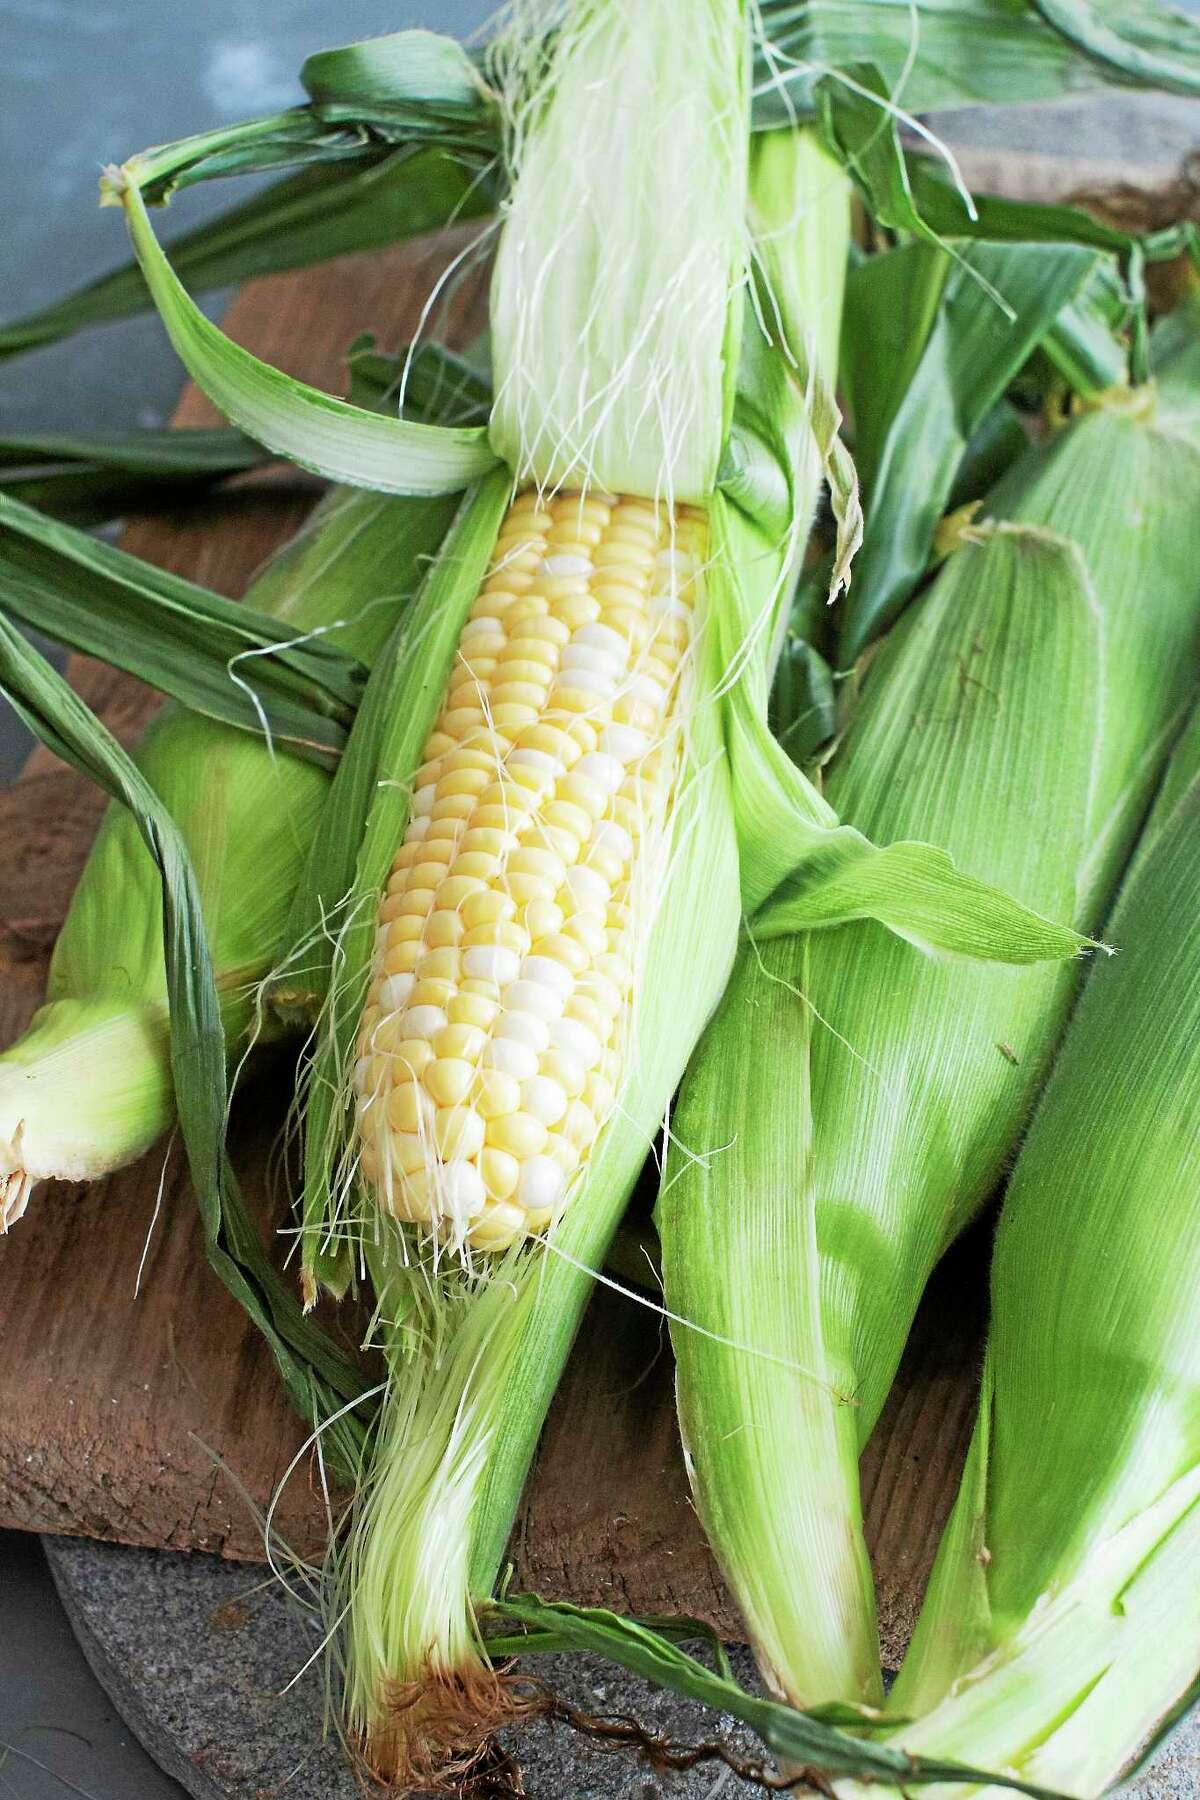 Matthew Mead - Associated Press Even butter and salt purists will enjoy new flavor combinations on corn.